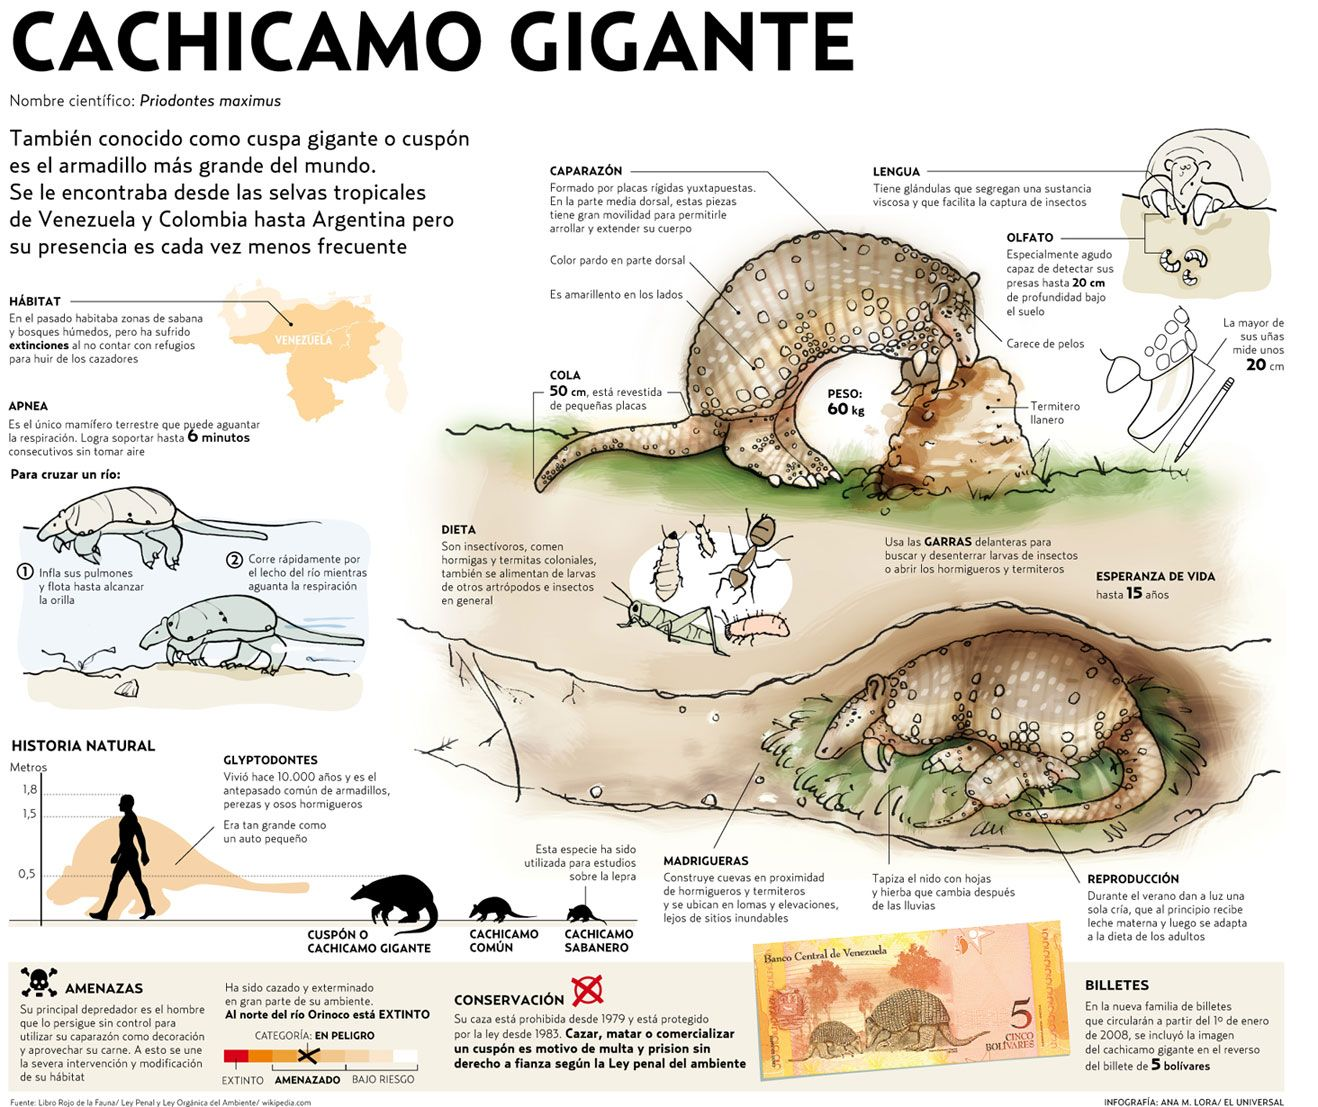 fauna venezolana en peligro de extincion - Buscar con Google ...